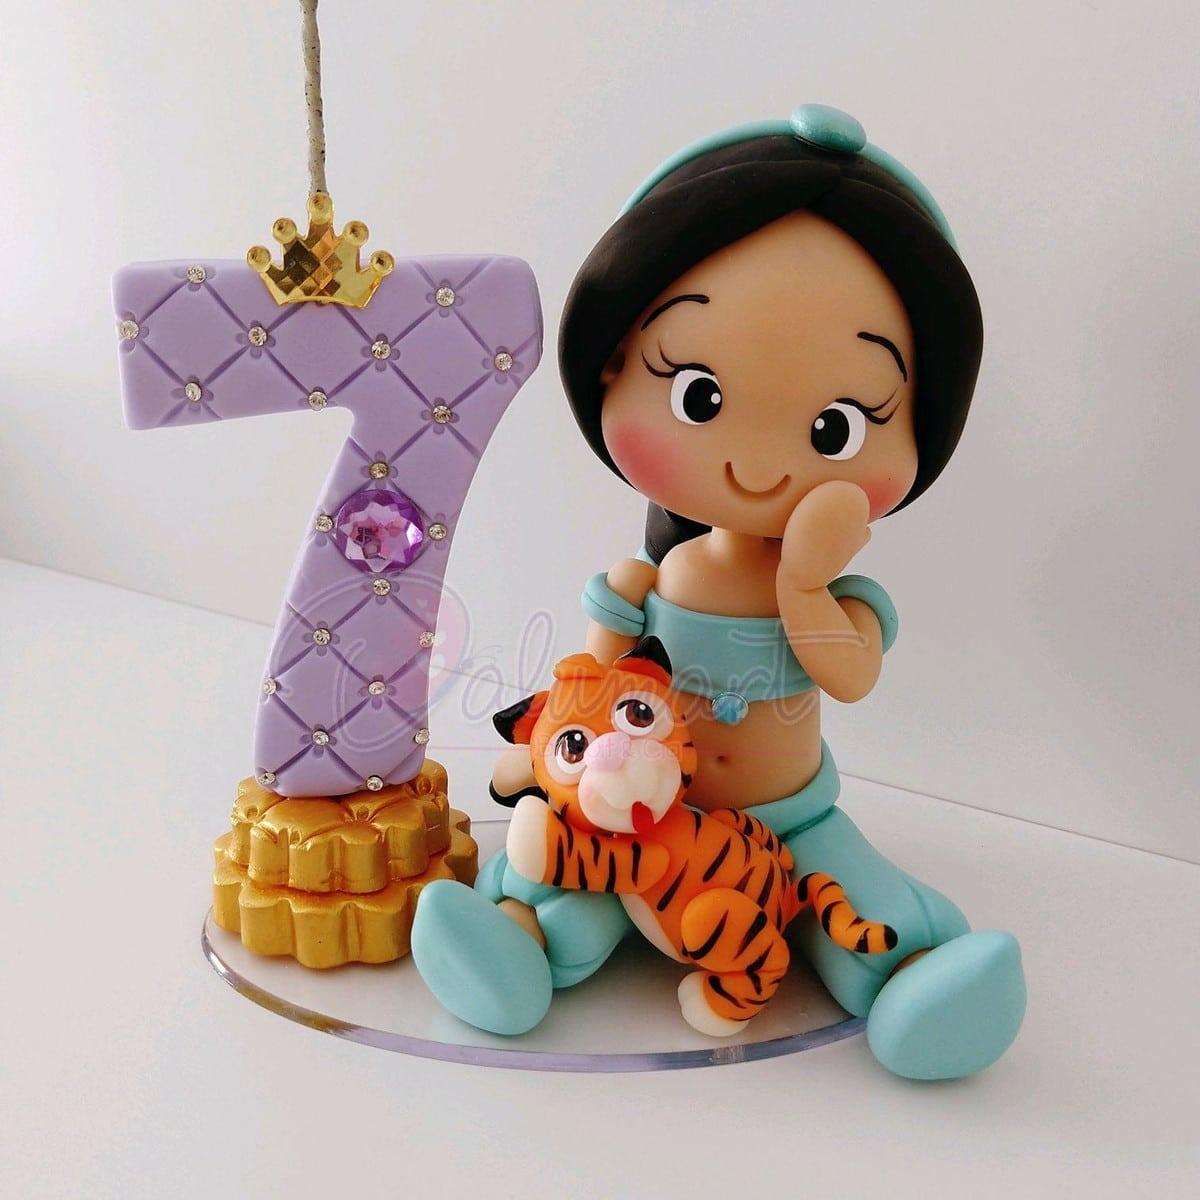 Topo De Bolo Princesa Jasmine No Elo7